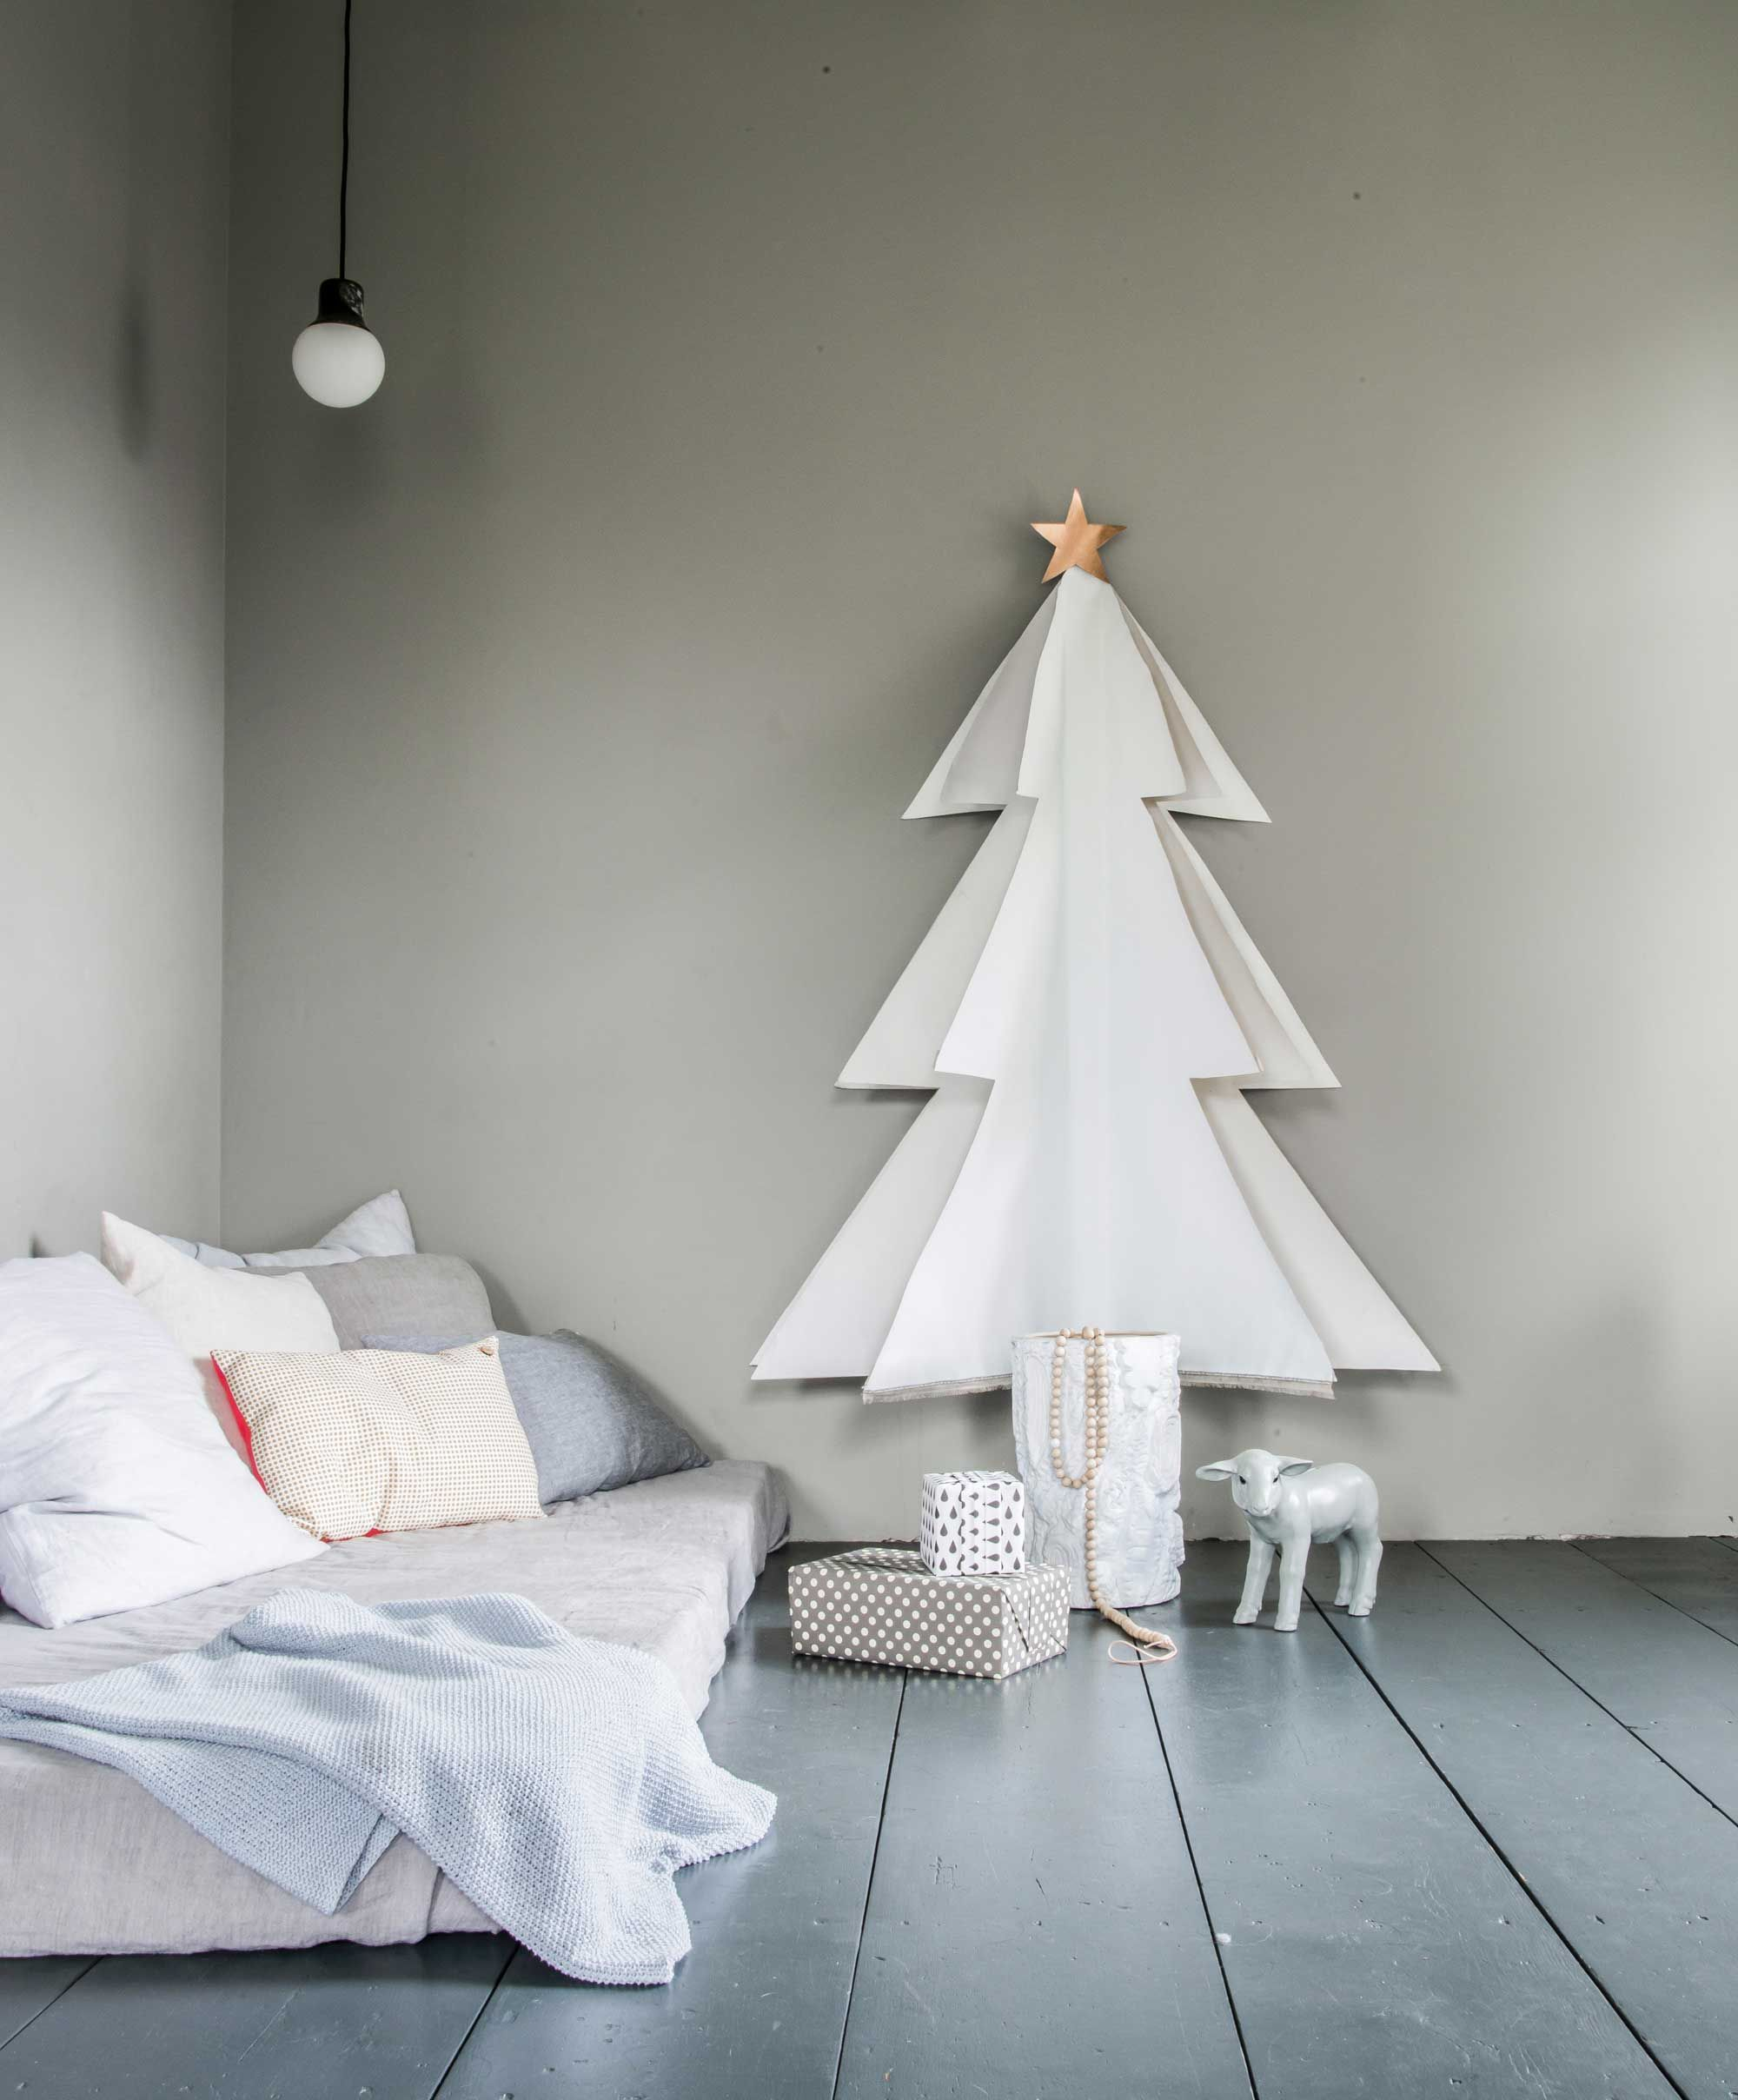 diy kerstboom diy christmas tree bron x. Black Bedroom Furniture Sets. Home Design Ideas